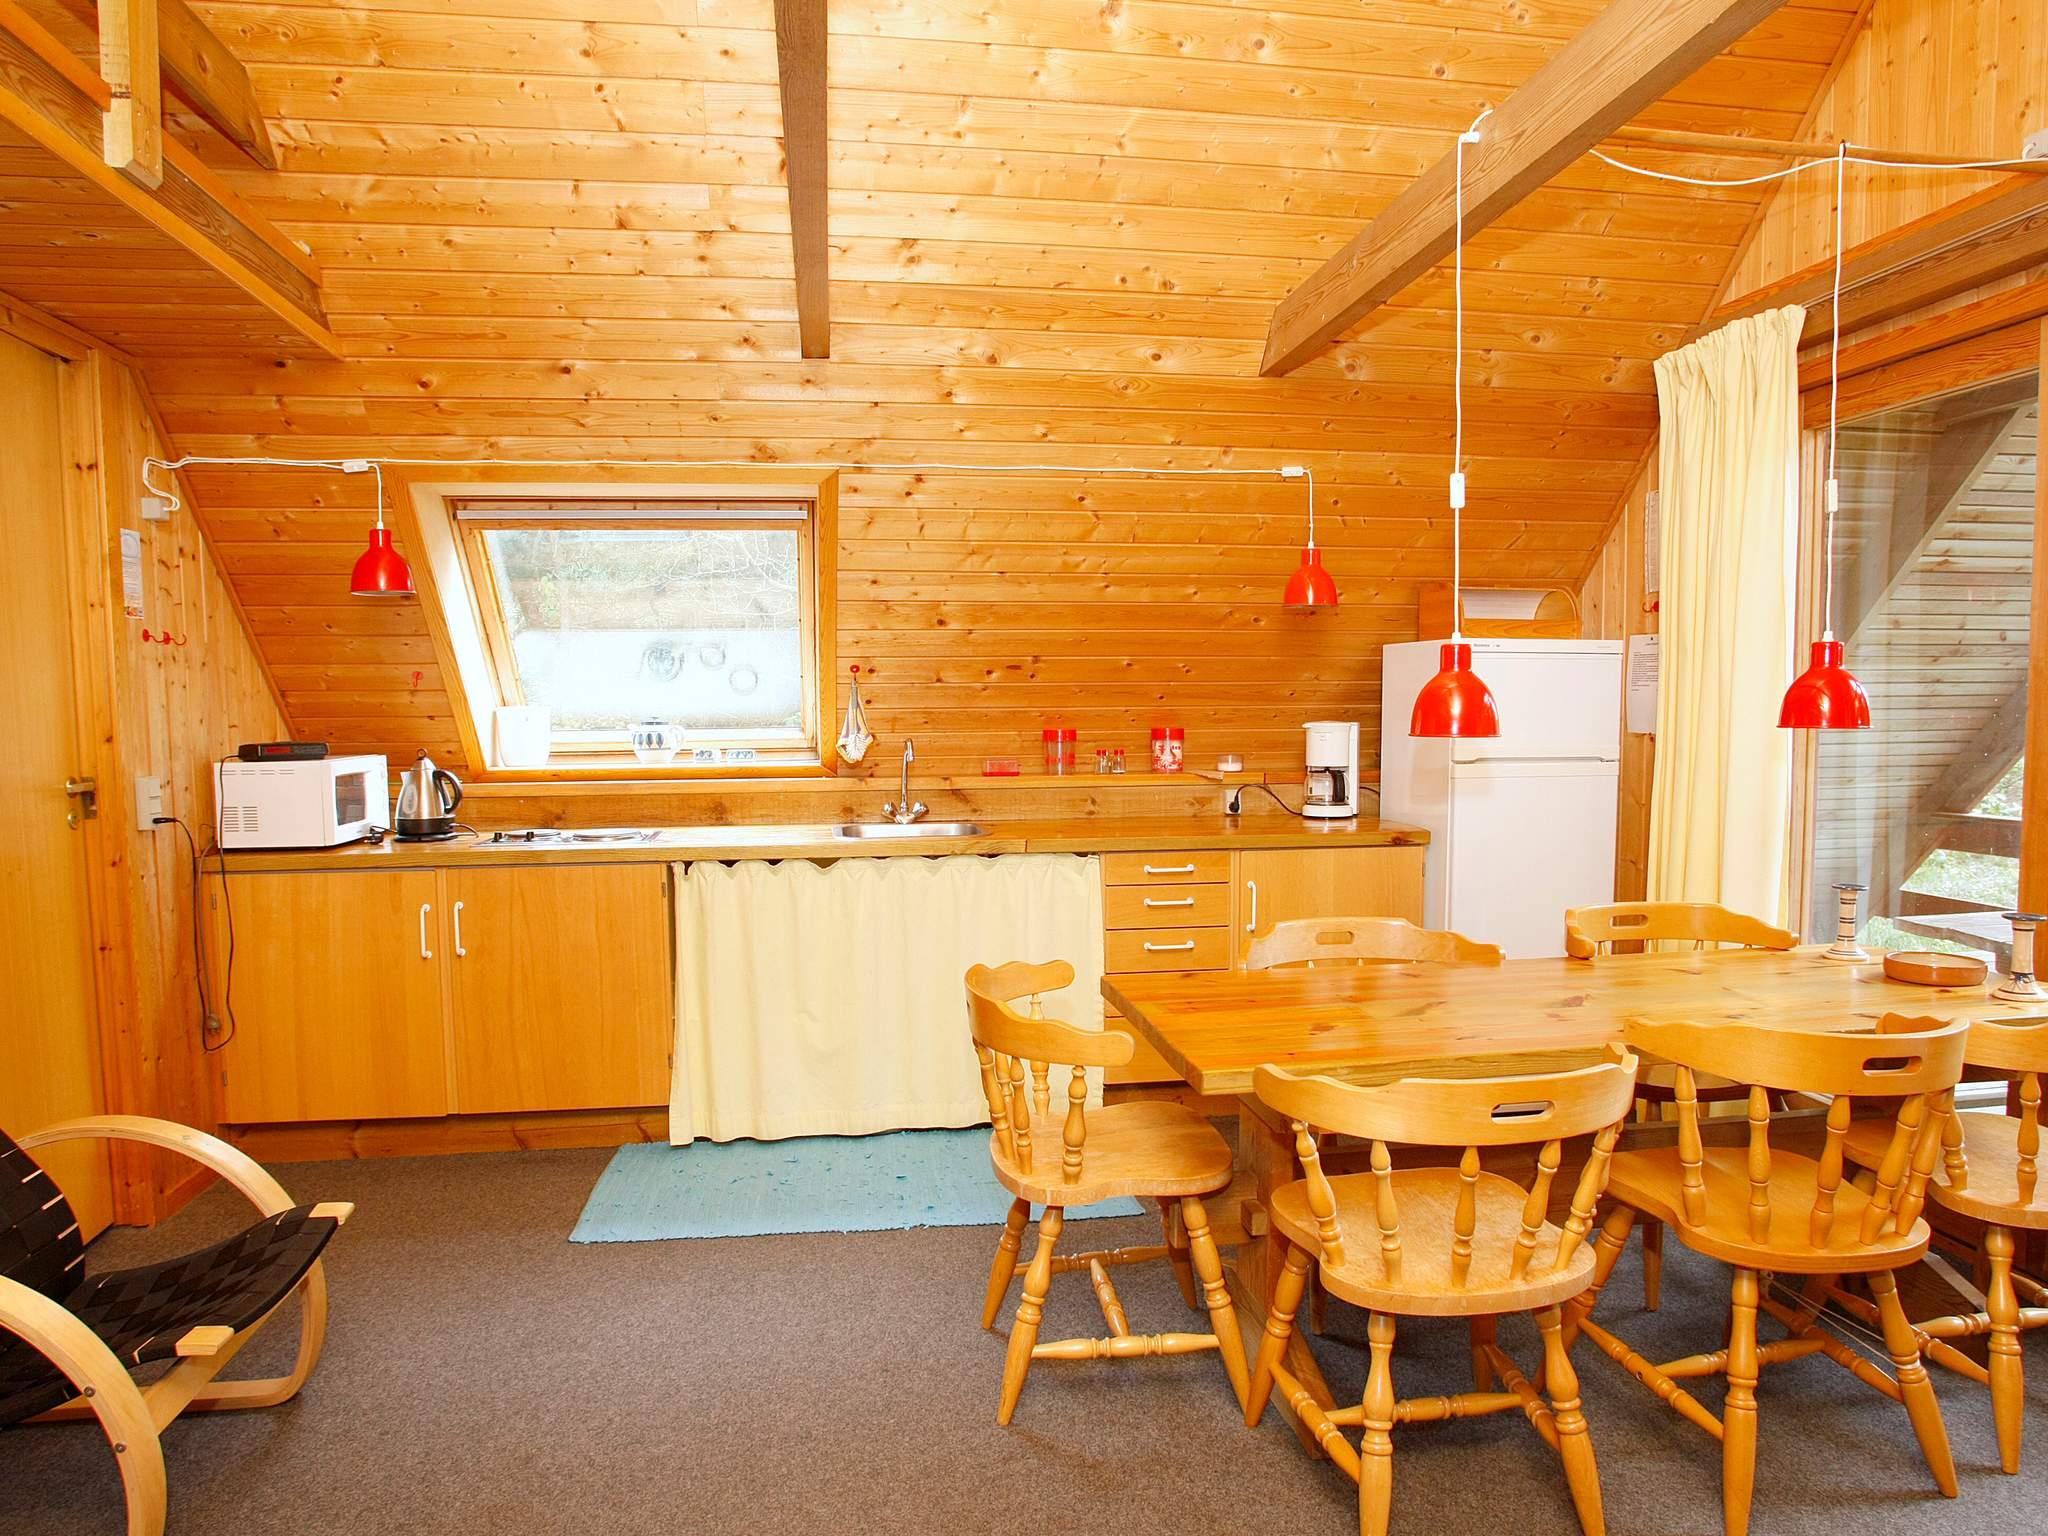 Ferienhaus Læsø/Vesterø (88183), Læsø, , Læsø, Dänemark, Bild 4